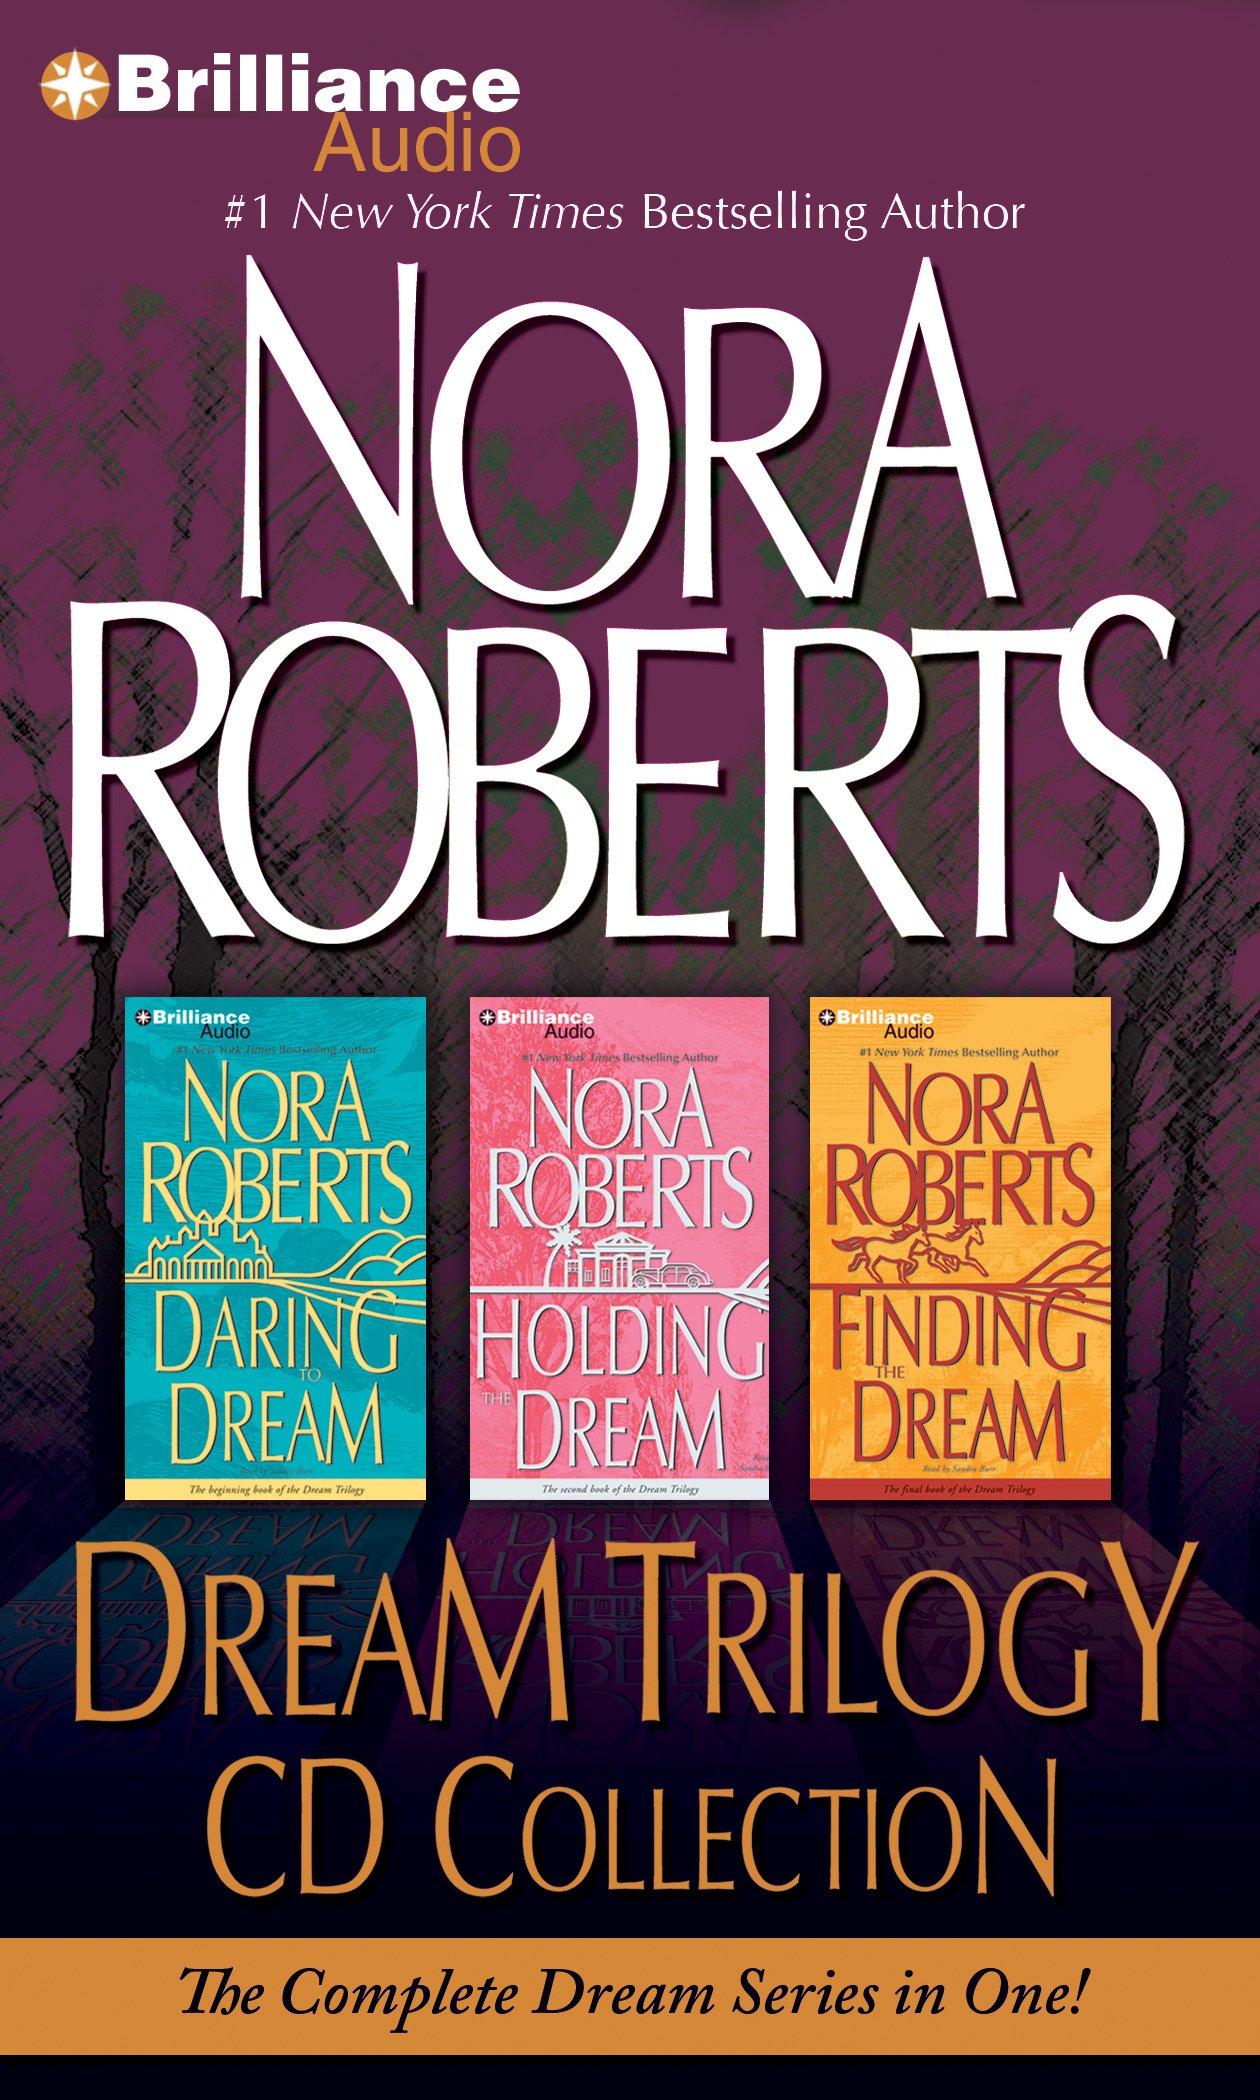 Nora Roberts Dream Trilogy CD Collection: Daring to Dream, Holding the  Dream, Finding the Dream: Amazon.co.uk: Nora Roberts, Sandra Burr:  9781469229065: ...